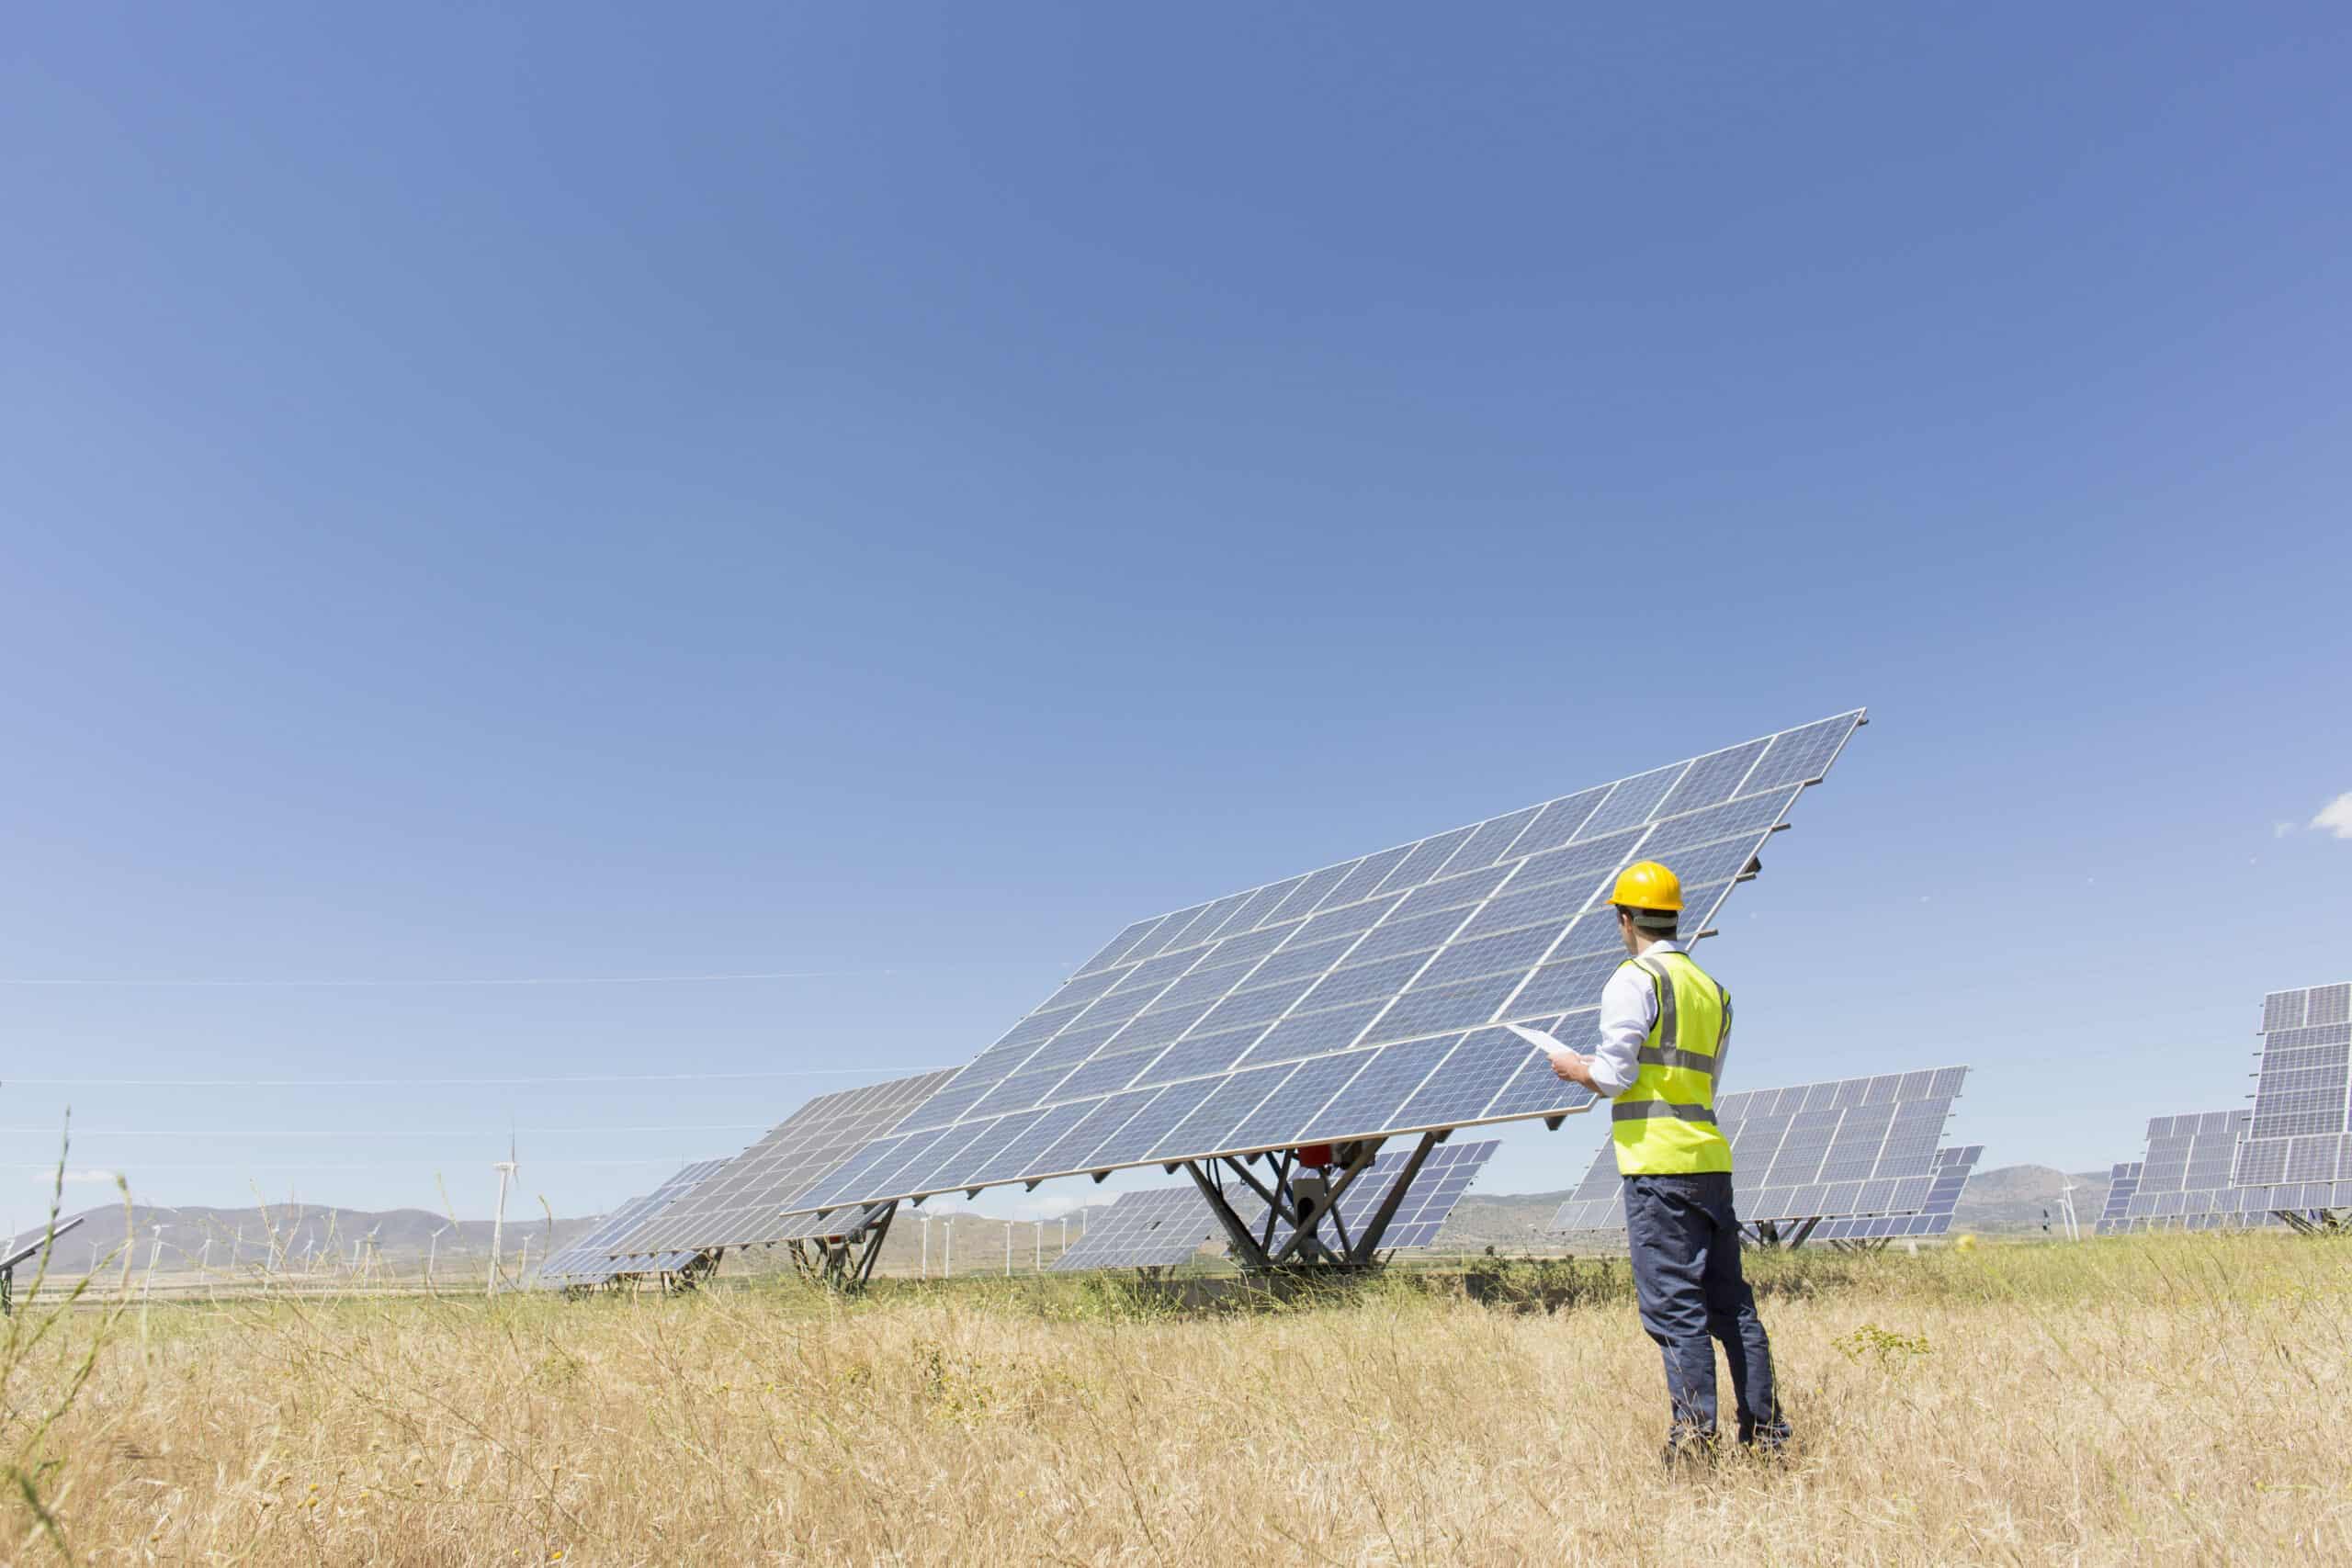 Special Institute on Solar Power/On Demand Webinar:  State Solar Regulation in Appalachia